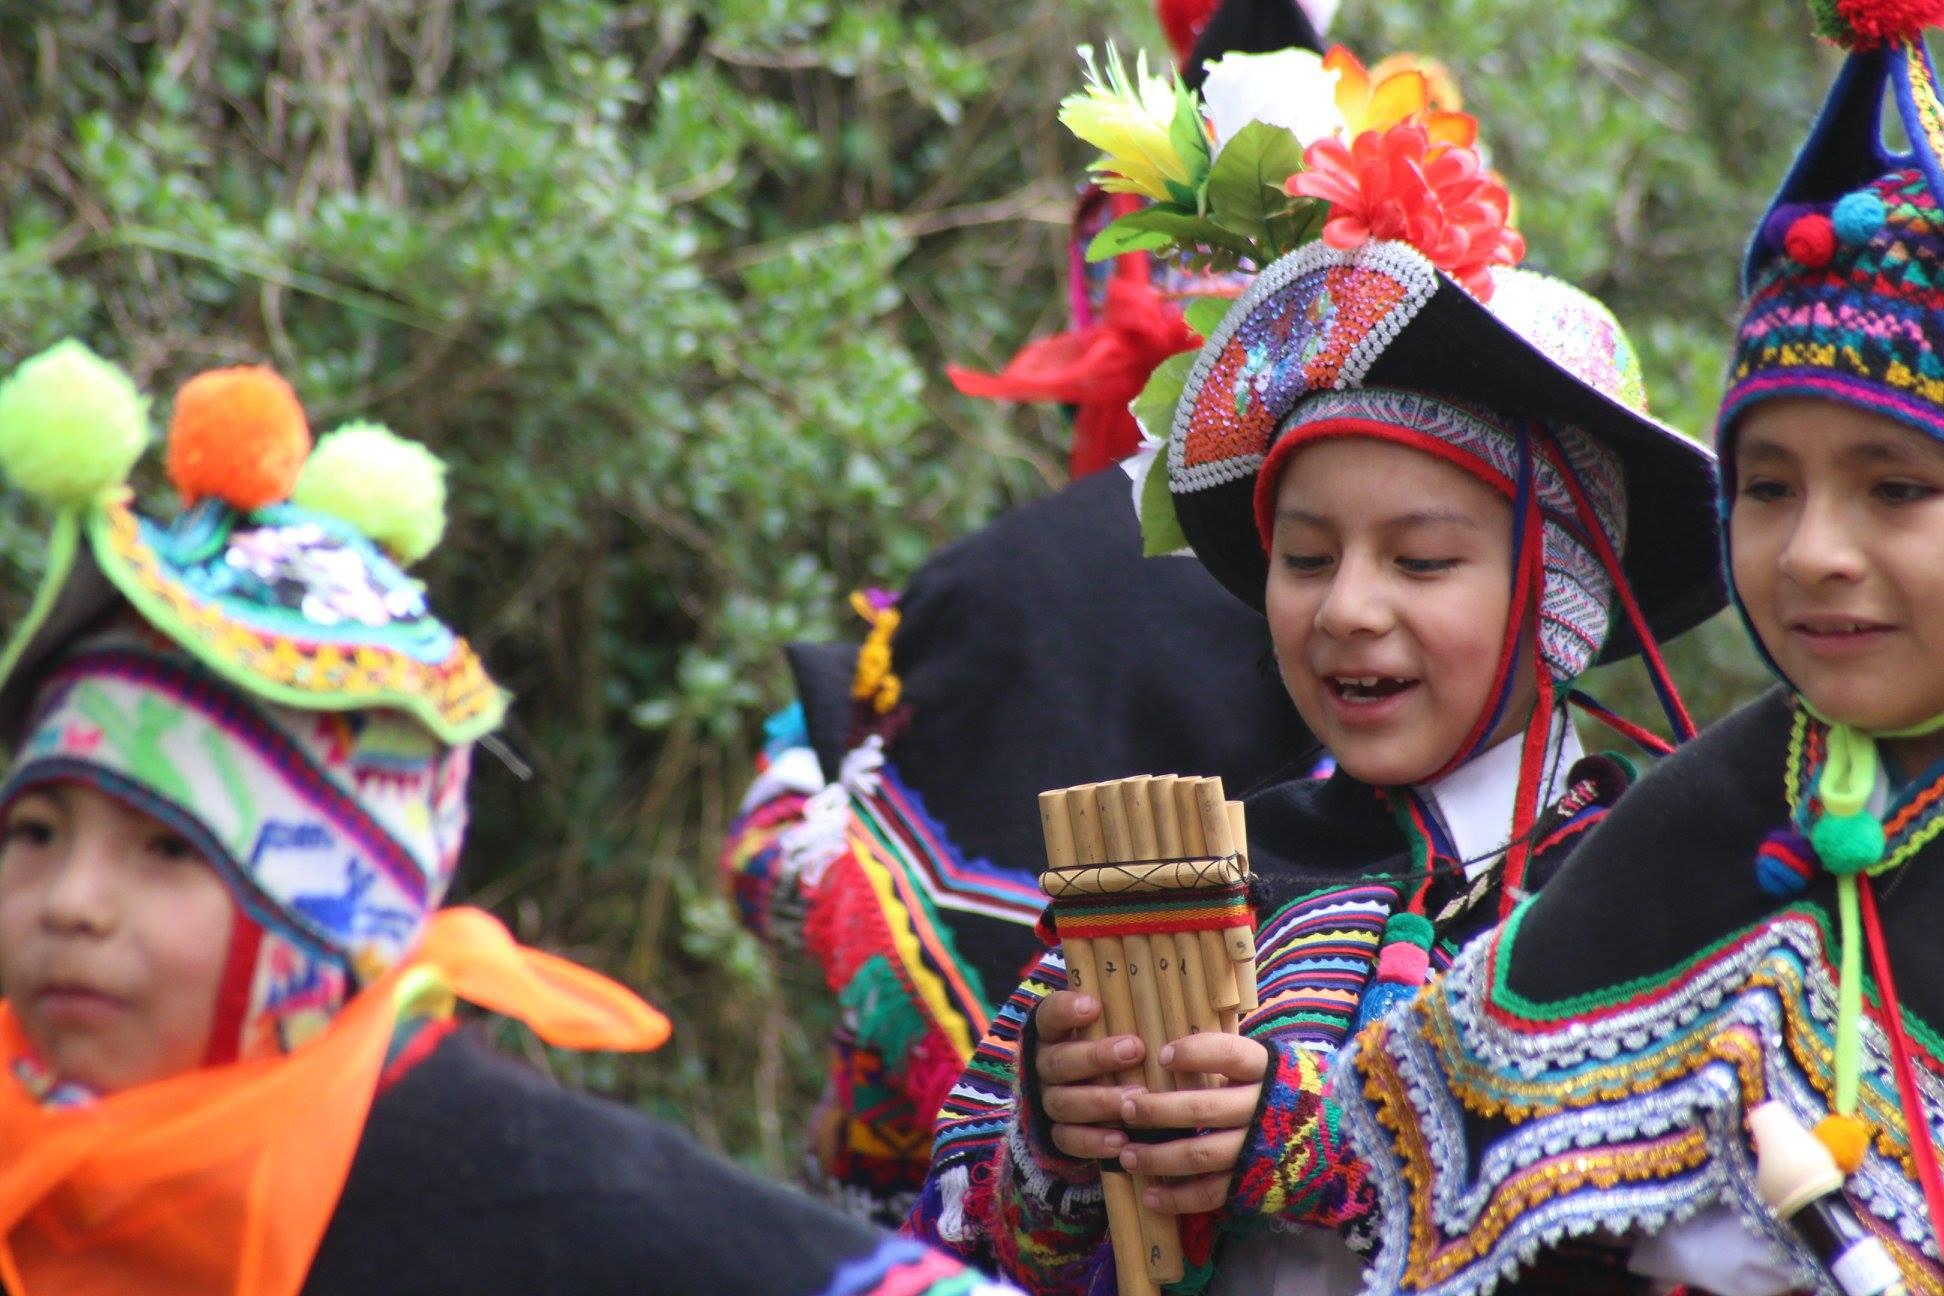 Niños peruanos cantan en quechua al Niño Dios © parroquia del Sagrario Huancavelica